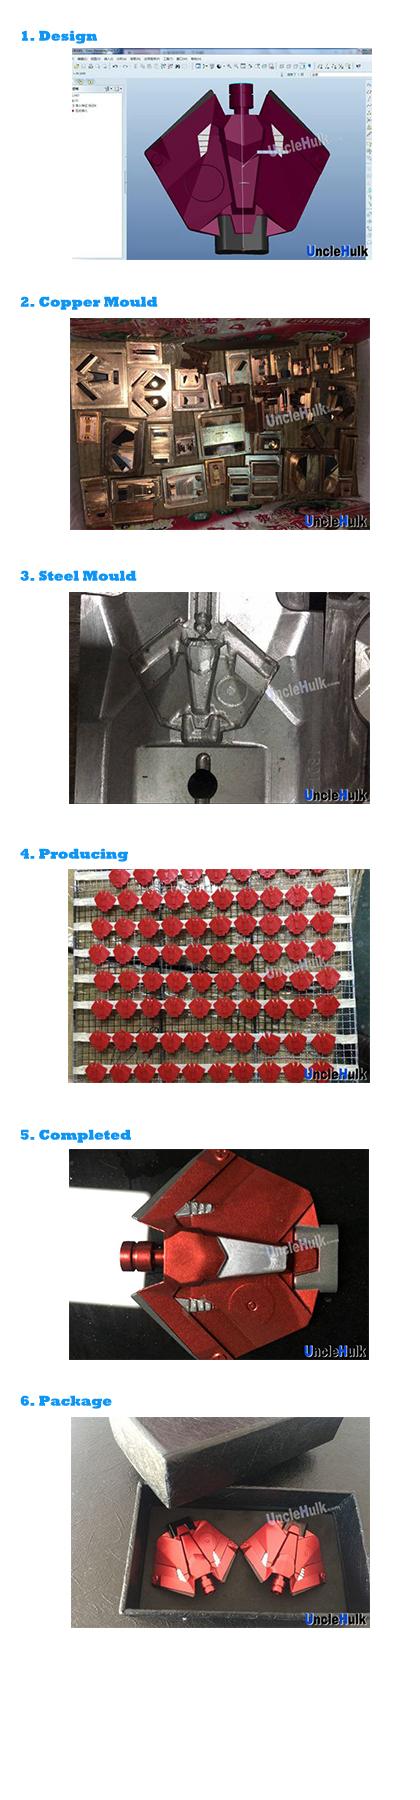 spiderman-2-webshooter-produce-process-unclehulk